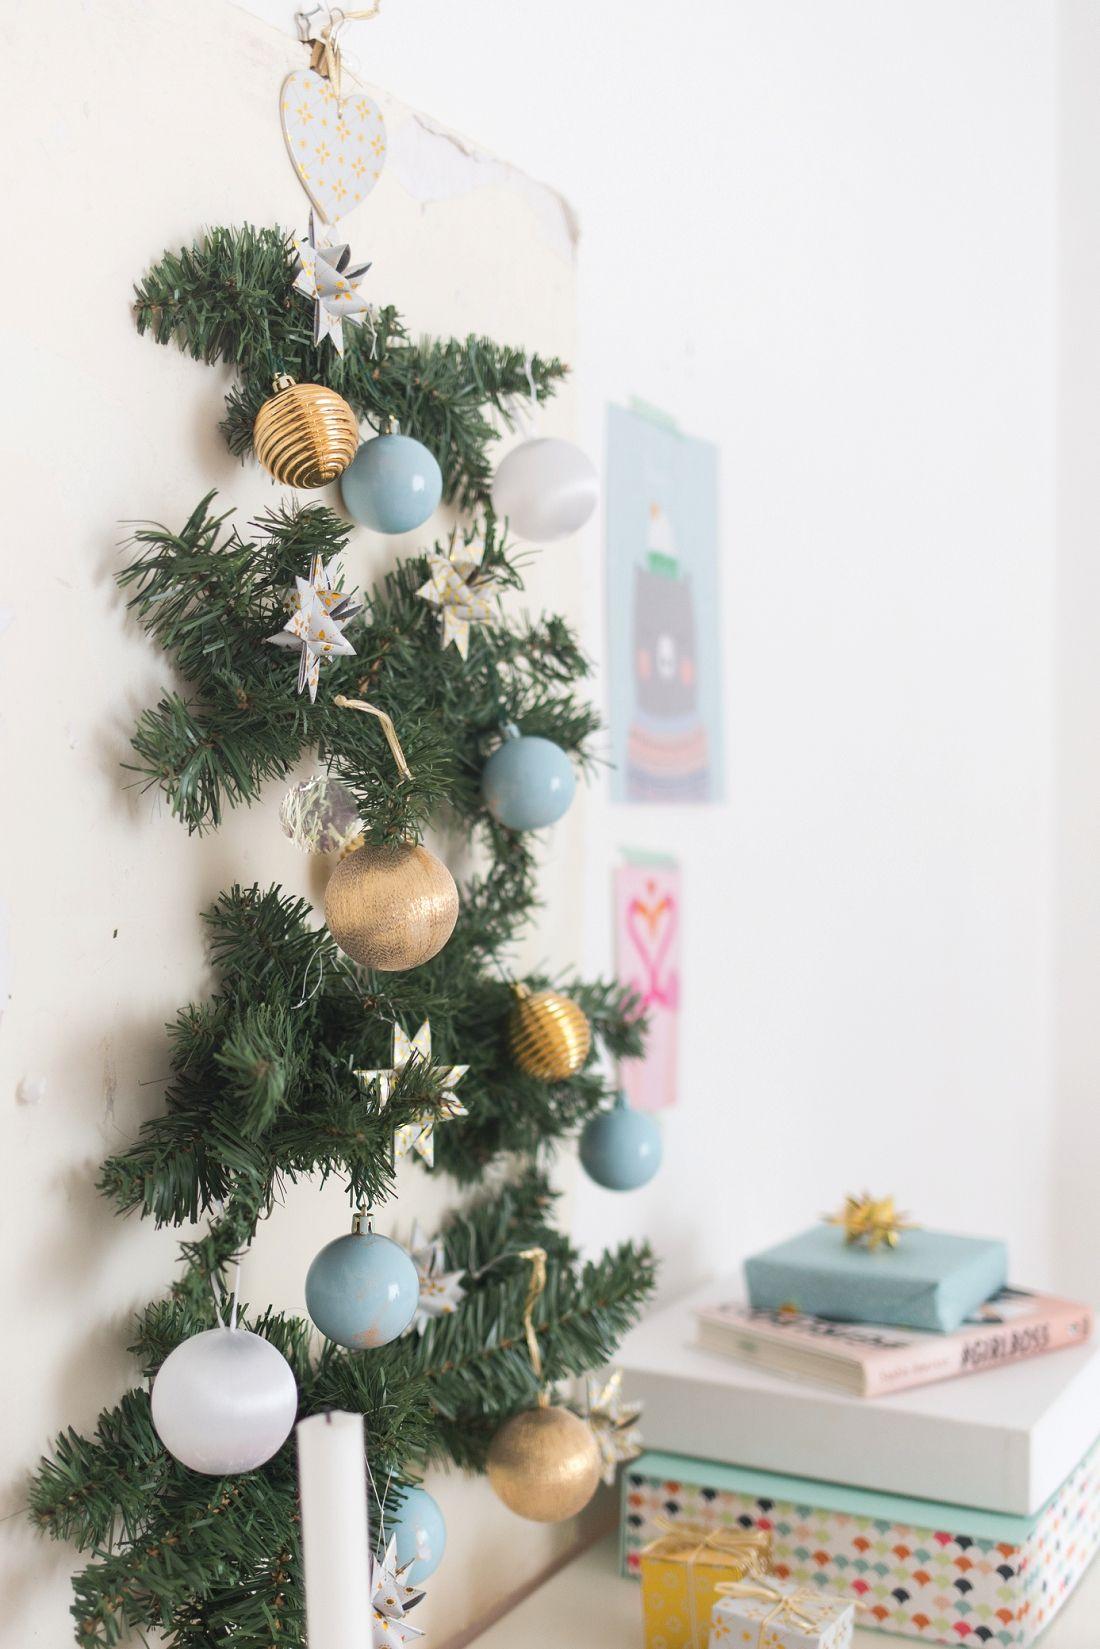 How To Make A Stylish Wall Tree For Small Space Living. Small Space  LivingSmall SpacesHoliday FunHoliday DecorHoliday IdeasDiy TutorialChristmas  ...